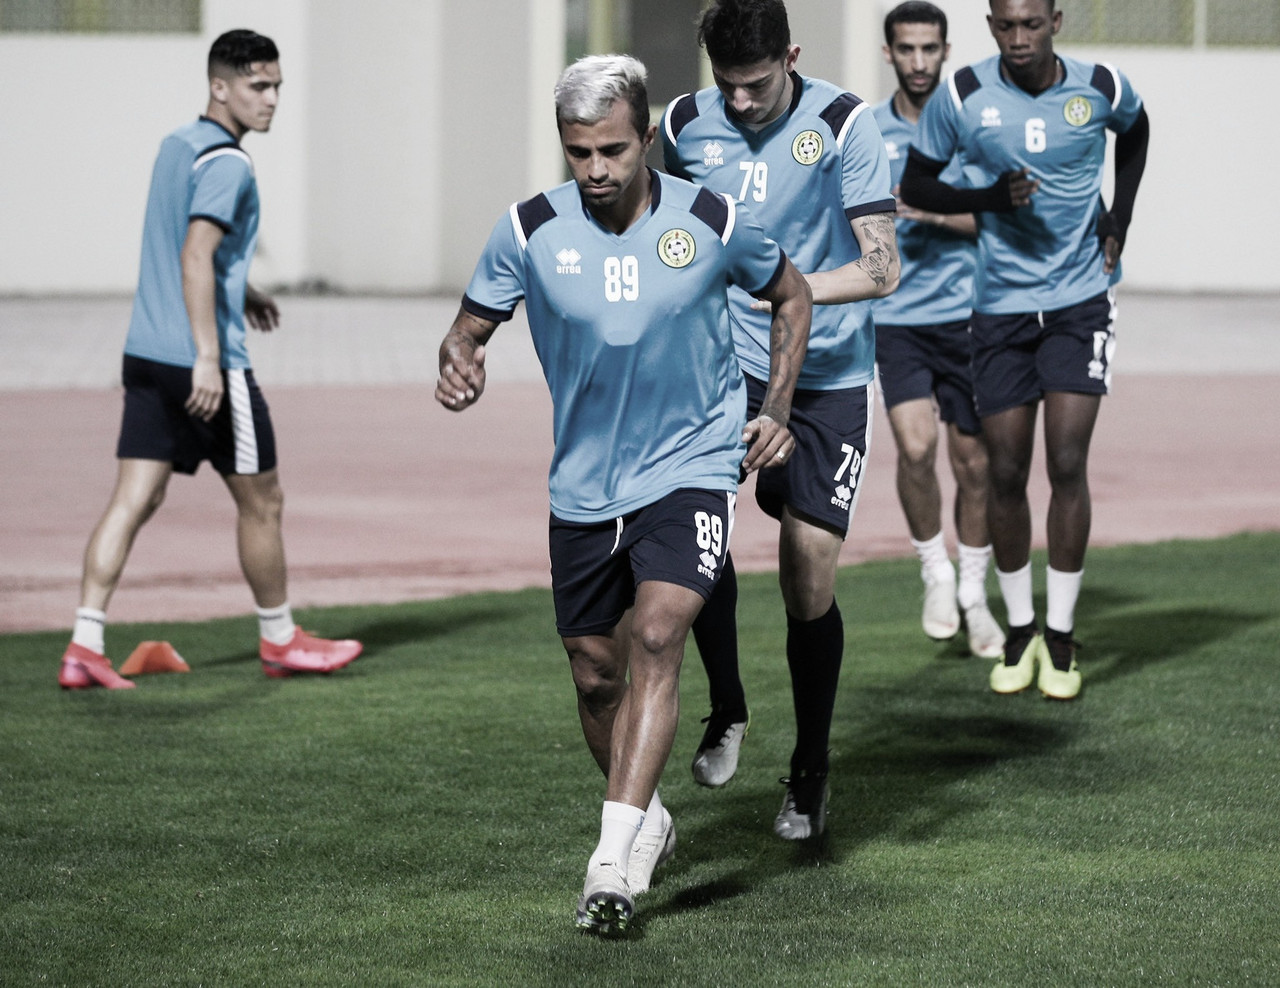 Wanderson projeta temporada vitoriosa pelo Ittihad Kalba/EAU